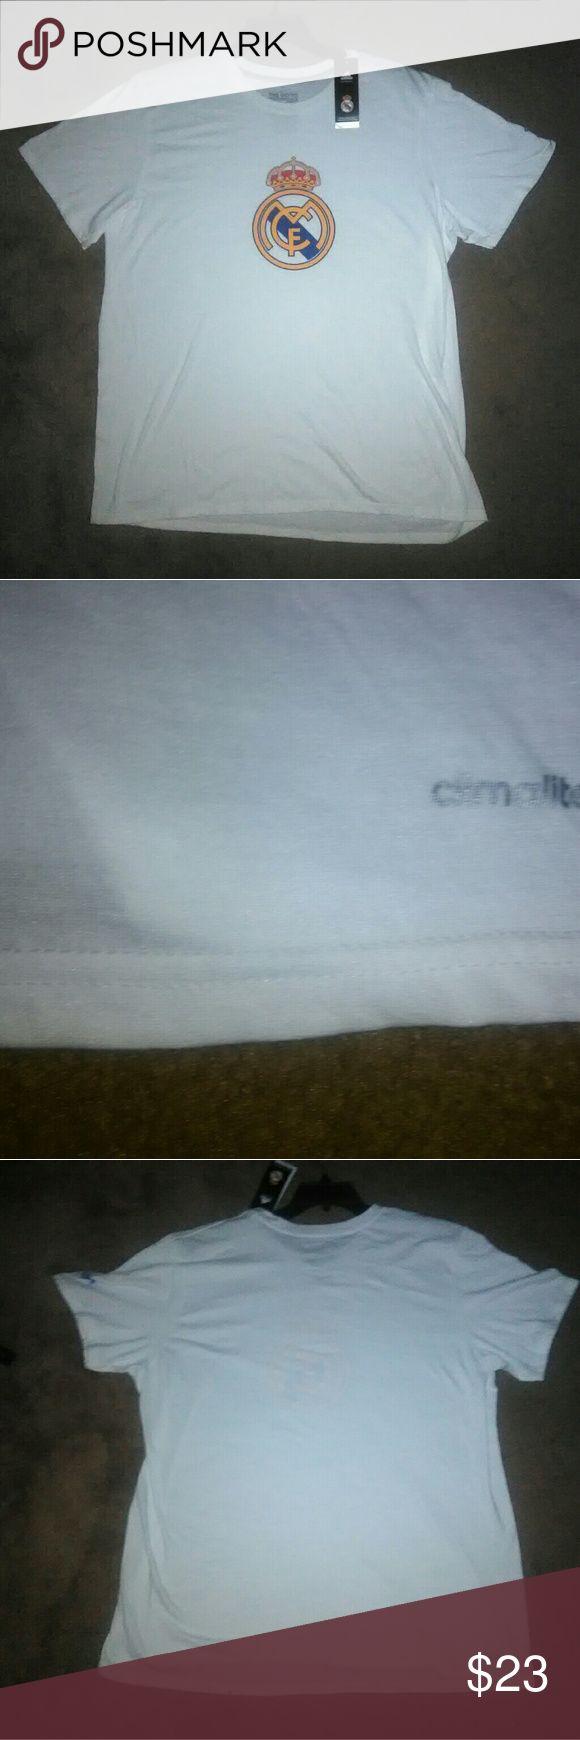 camiseta real madrid mujer blanca